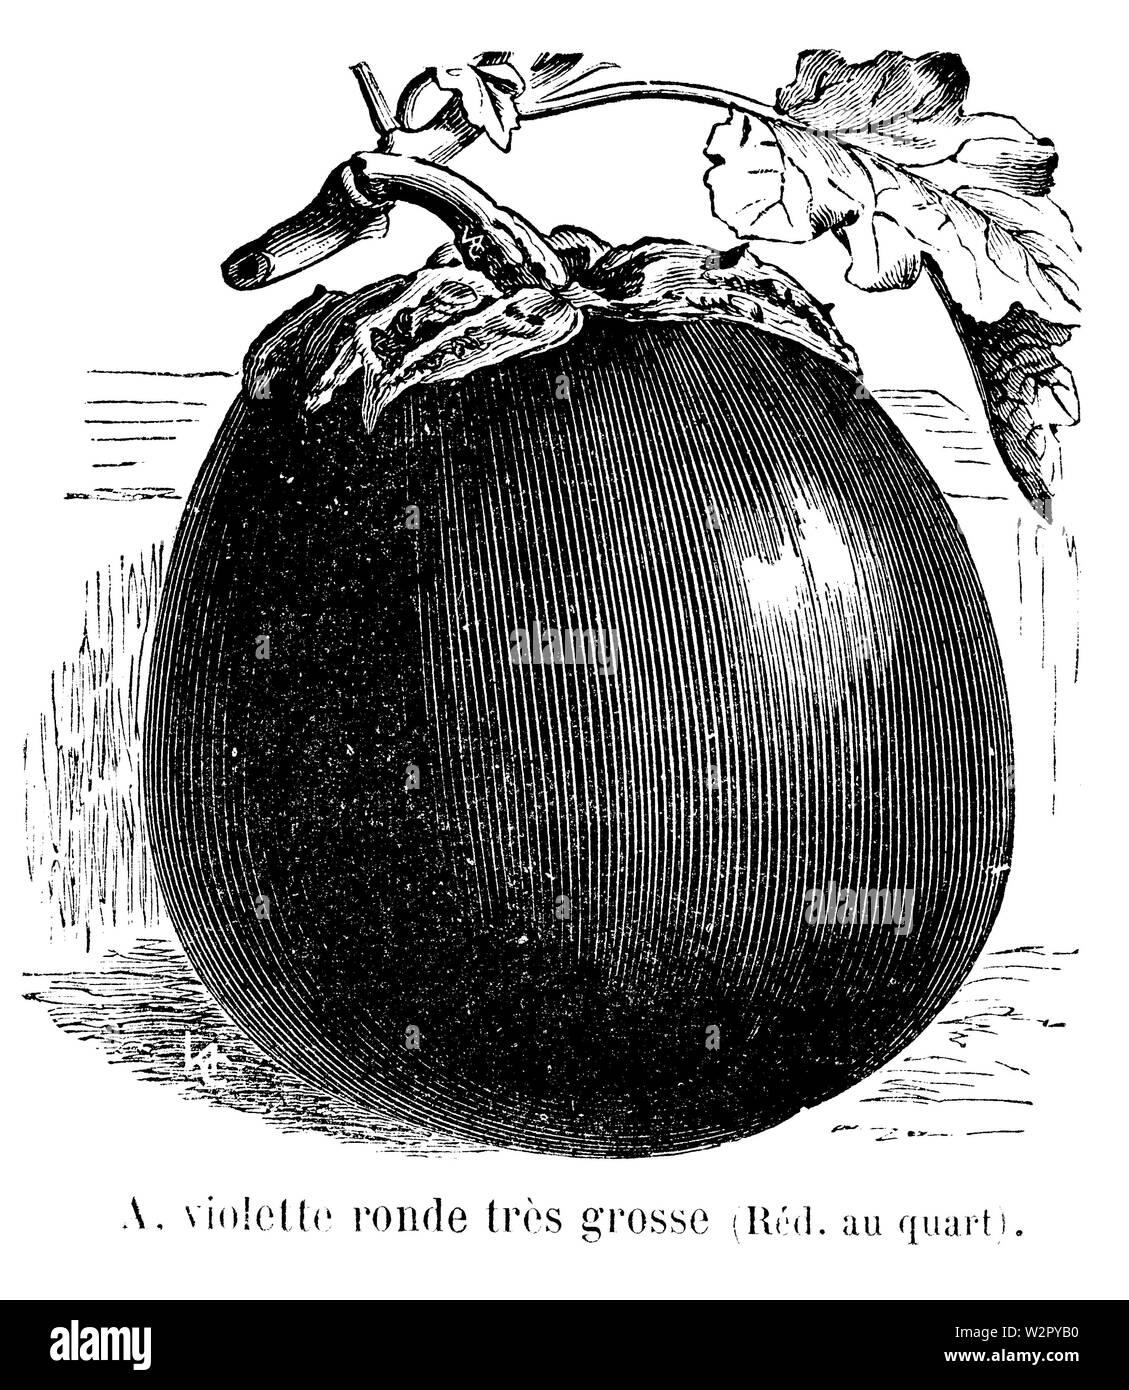 Aubergine violette ronde très grosse Vilmorin-Andrieux 1904 - Stock Image